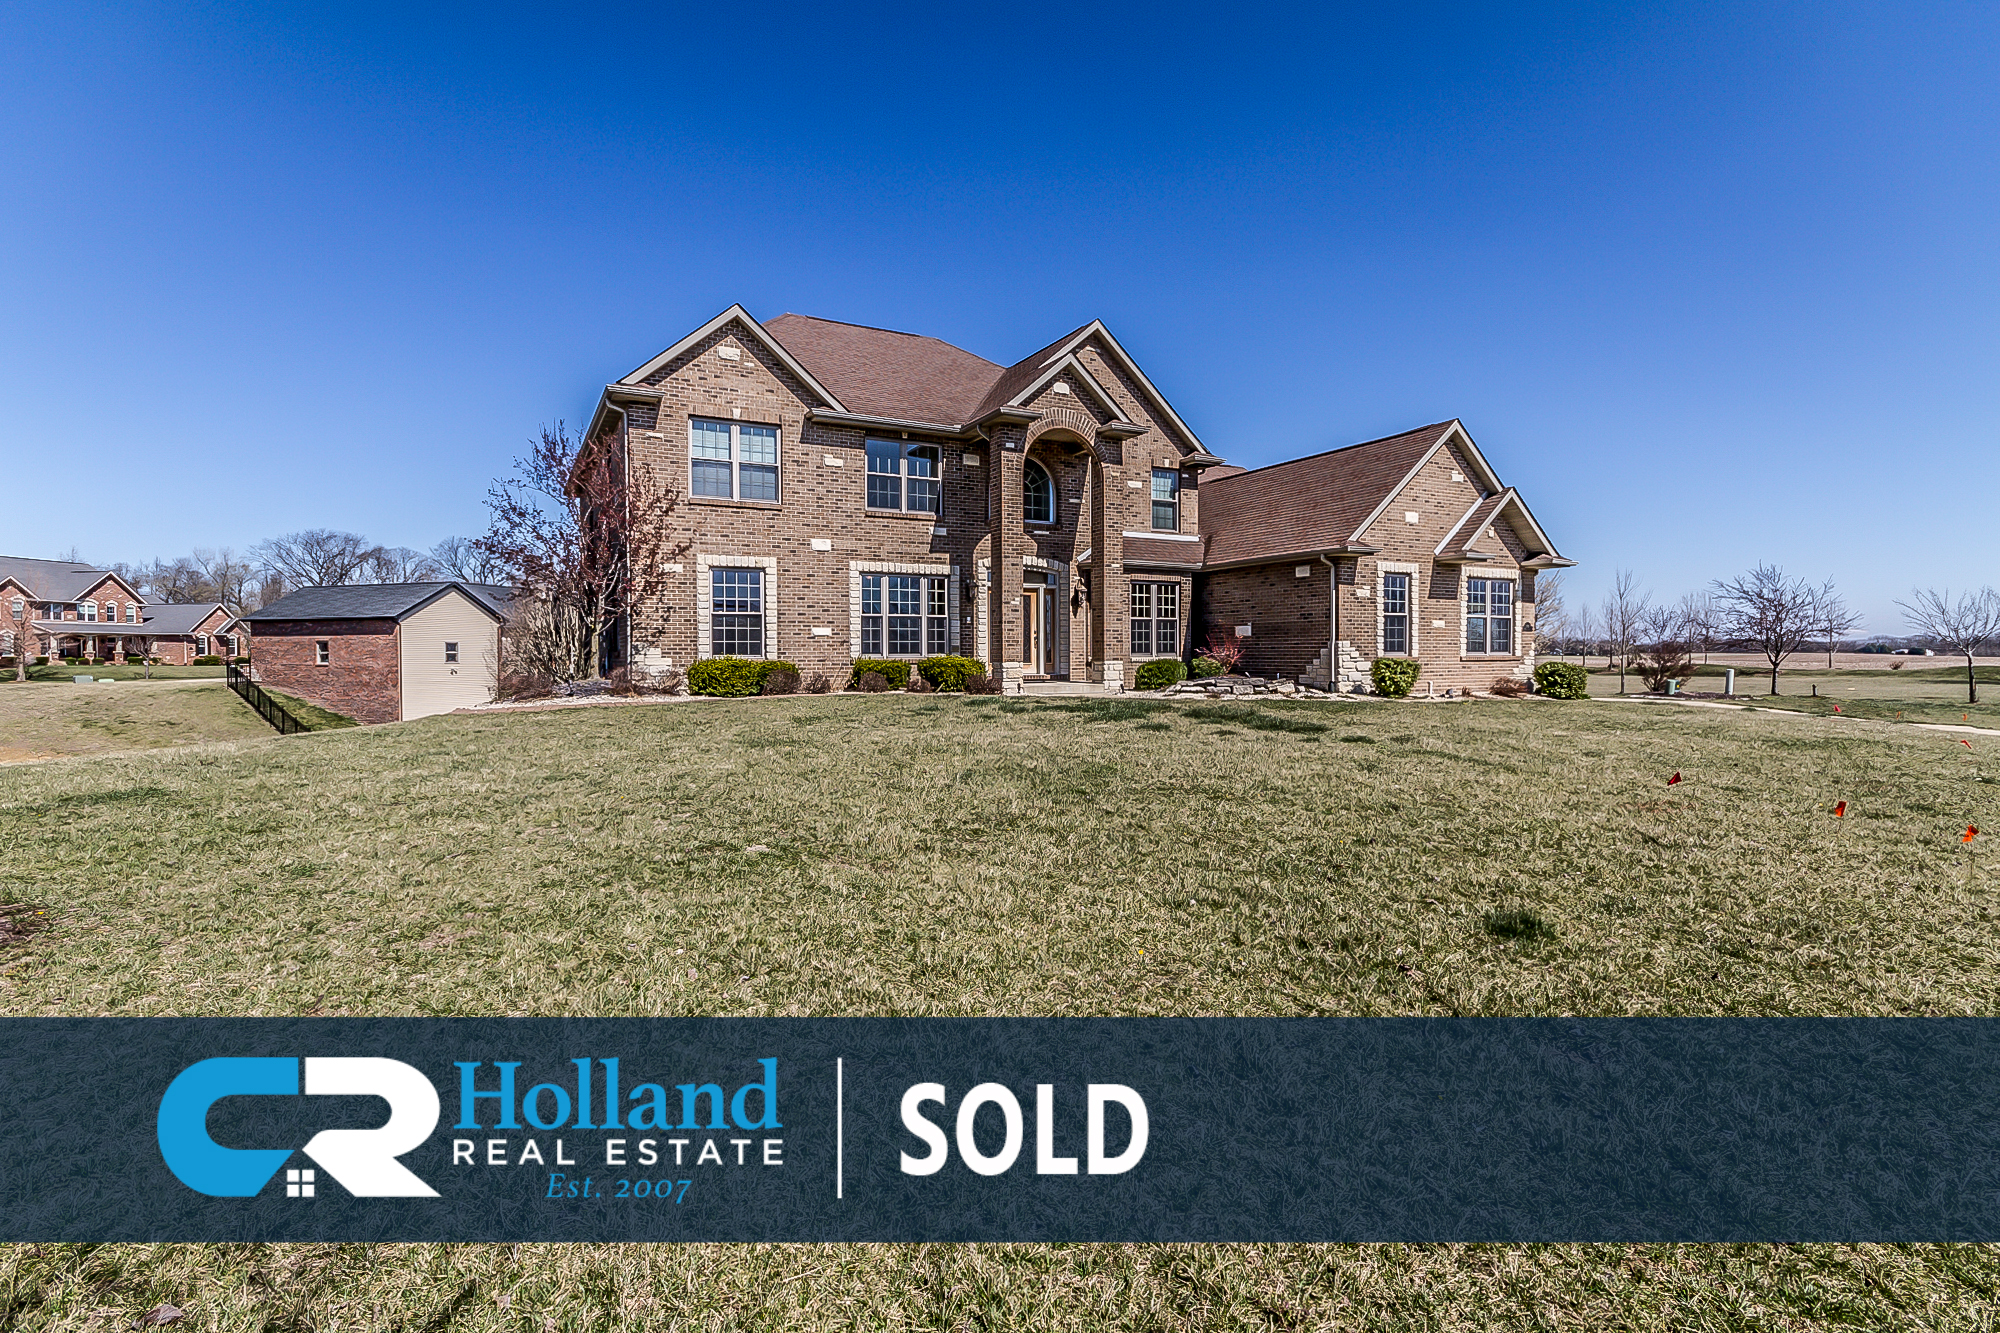 Scott-AFB-Homes-For-Sale-O'Fallon-Illinois-CR-Holland-1.jpg